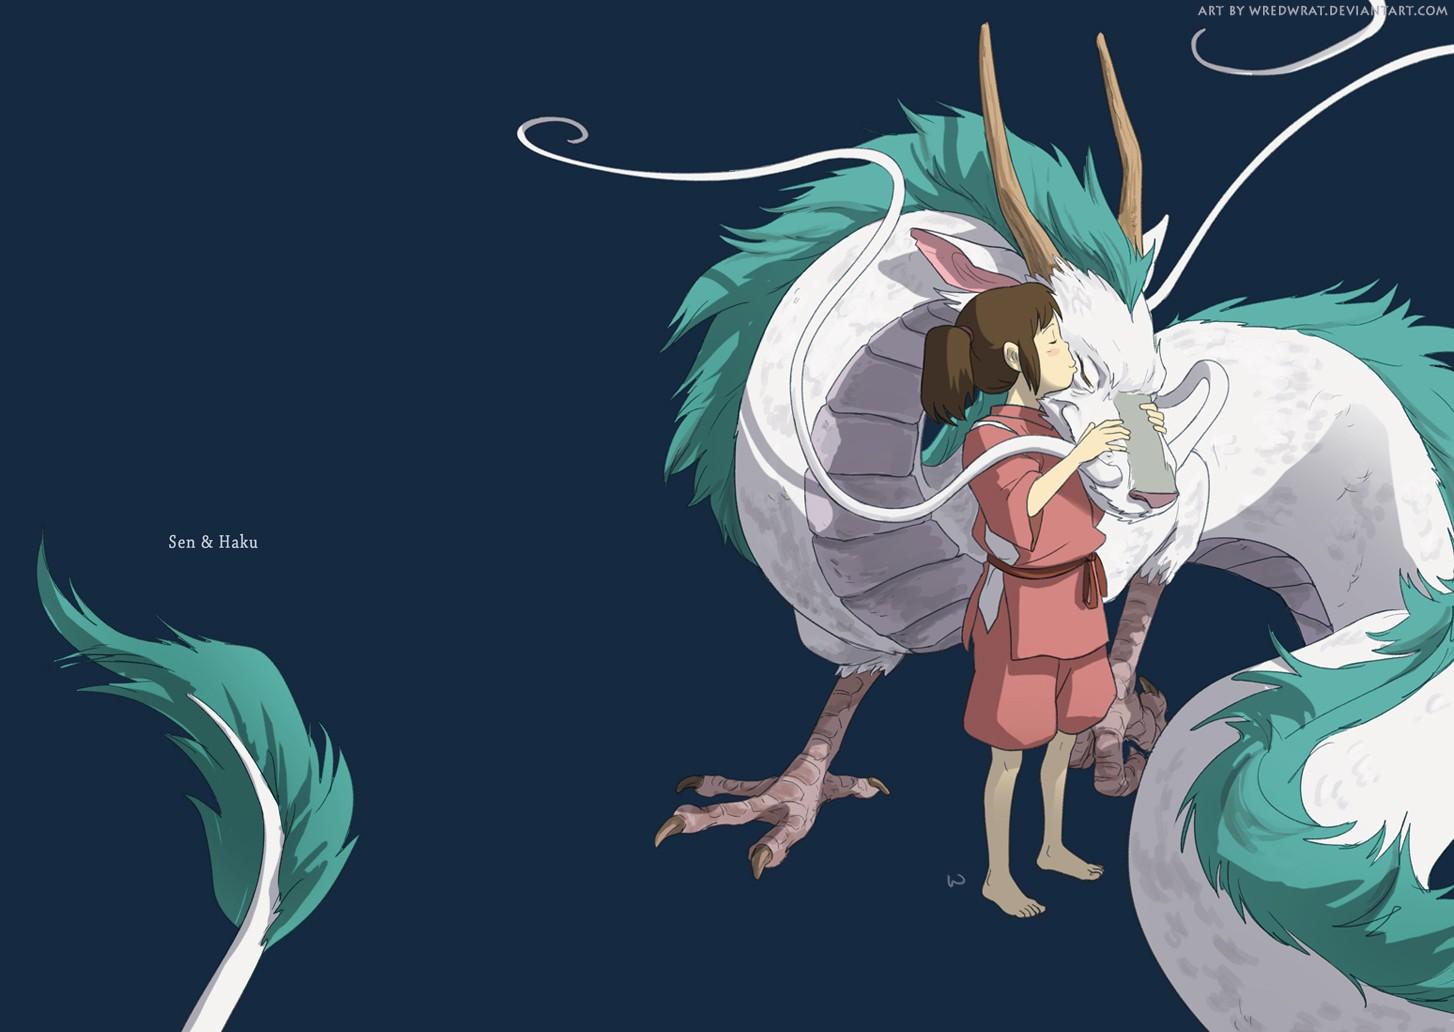 Illustration Anime Spirited Away Cartoon Studio Ghibli Fictional Character 1454x1032 Px